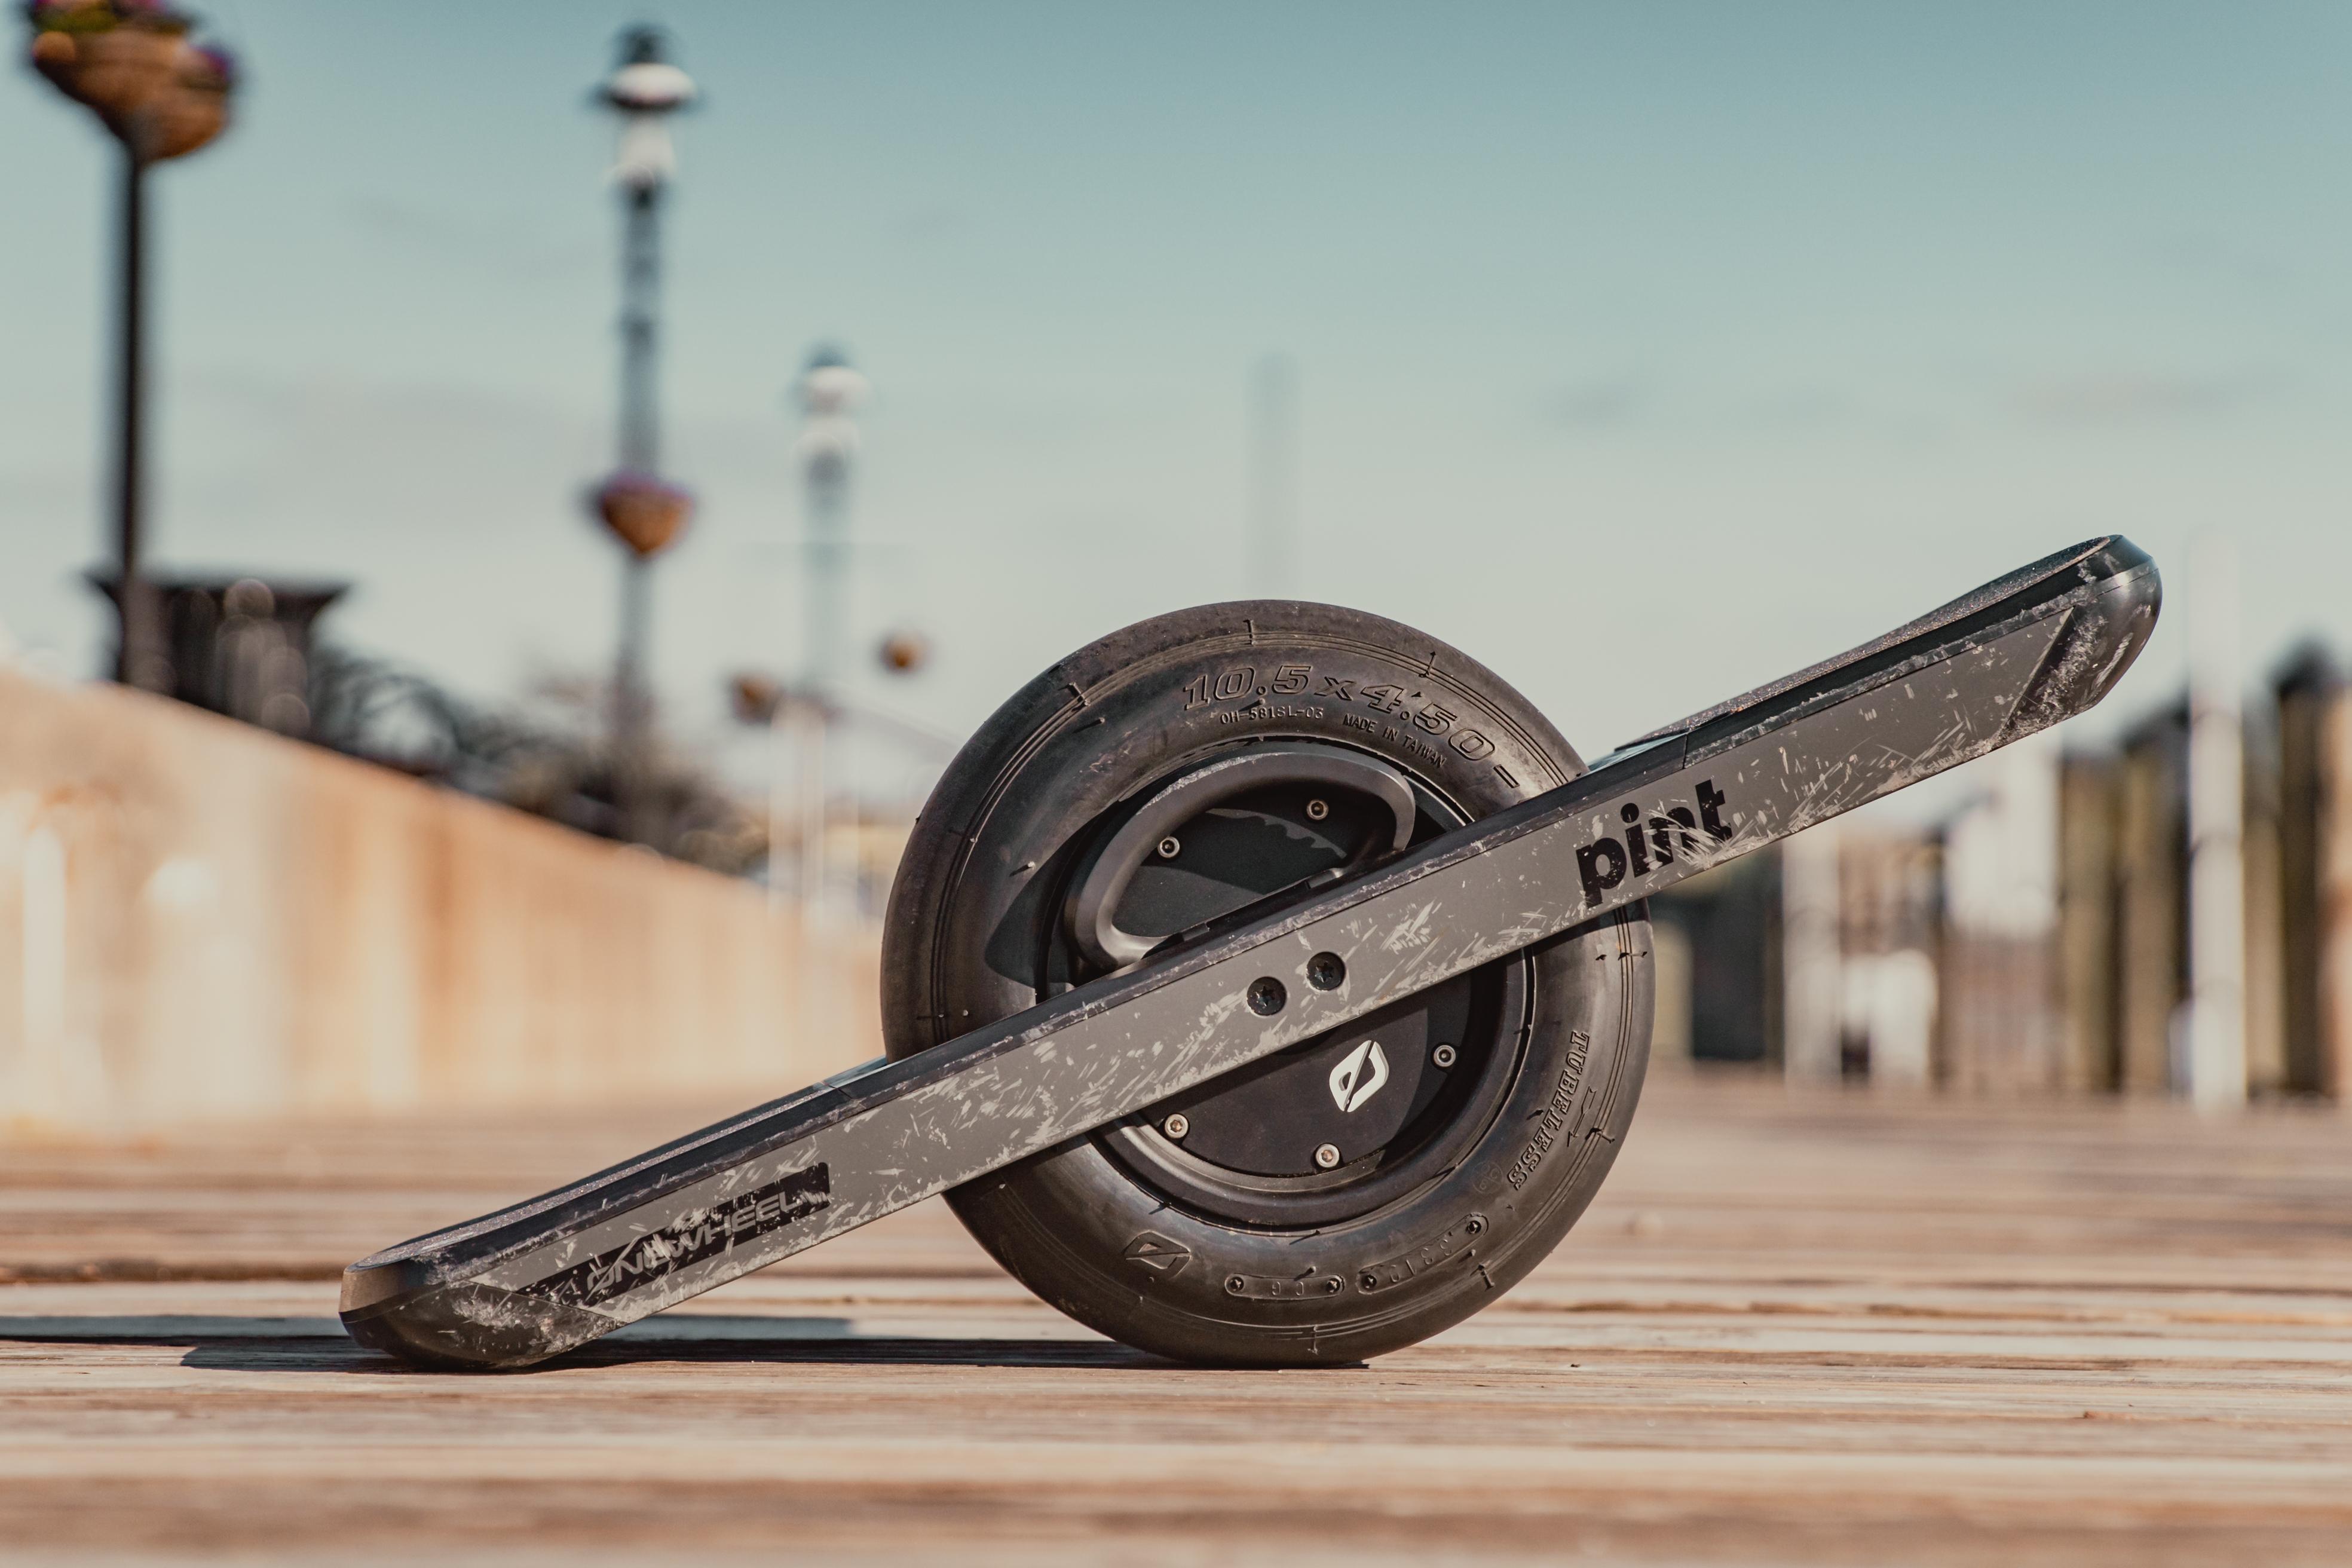 Quick Onewheel Rental Tips for Beginners